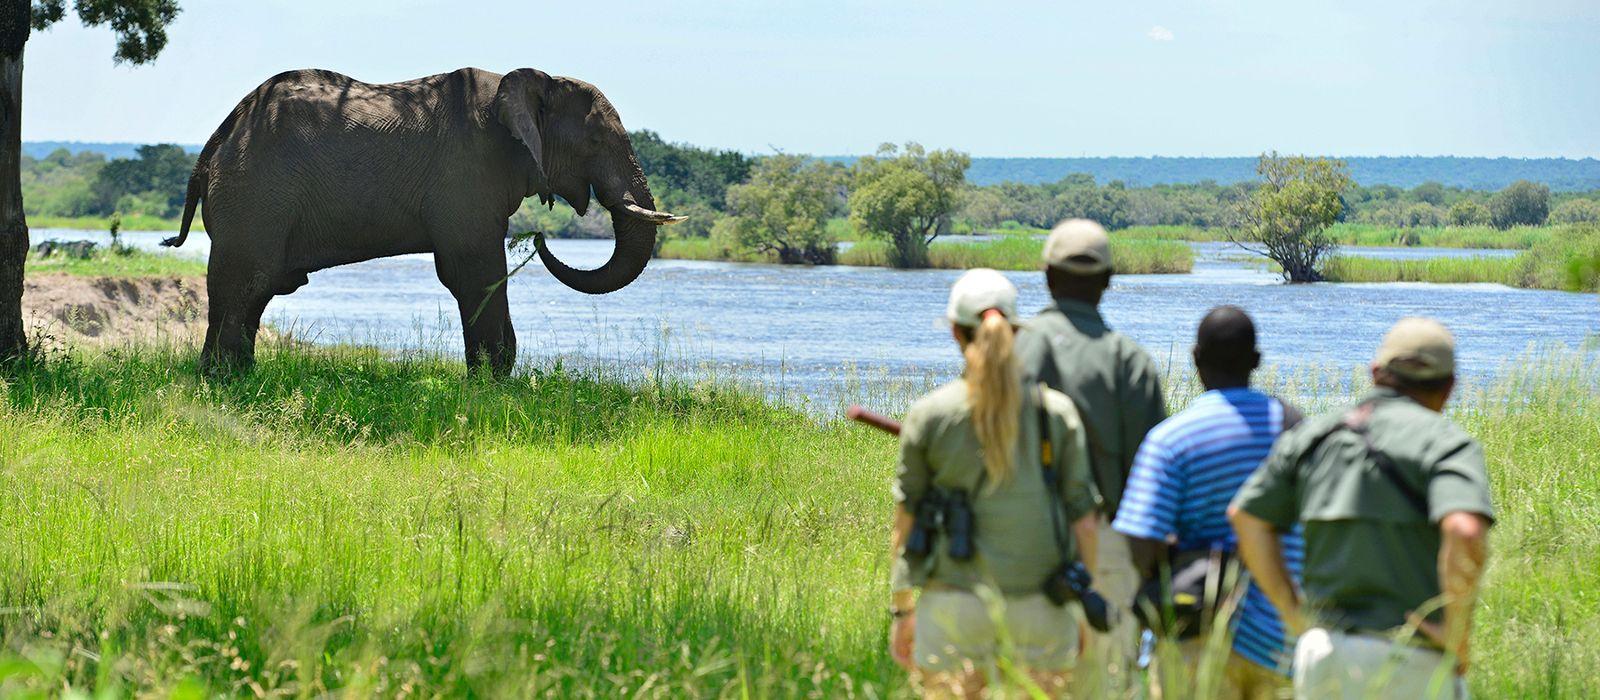 Südafrika, Simbabwe & Botswana: Wilde Tiere & glitzernde Gewässer Urlaub 5